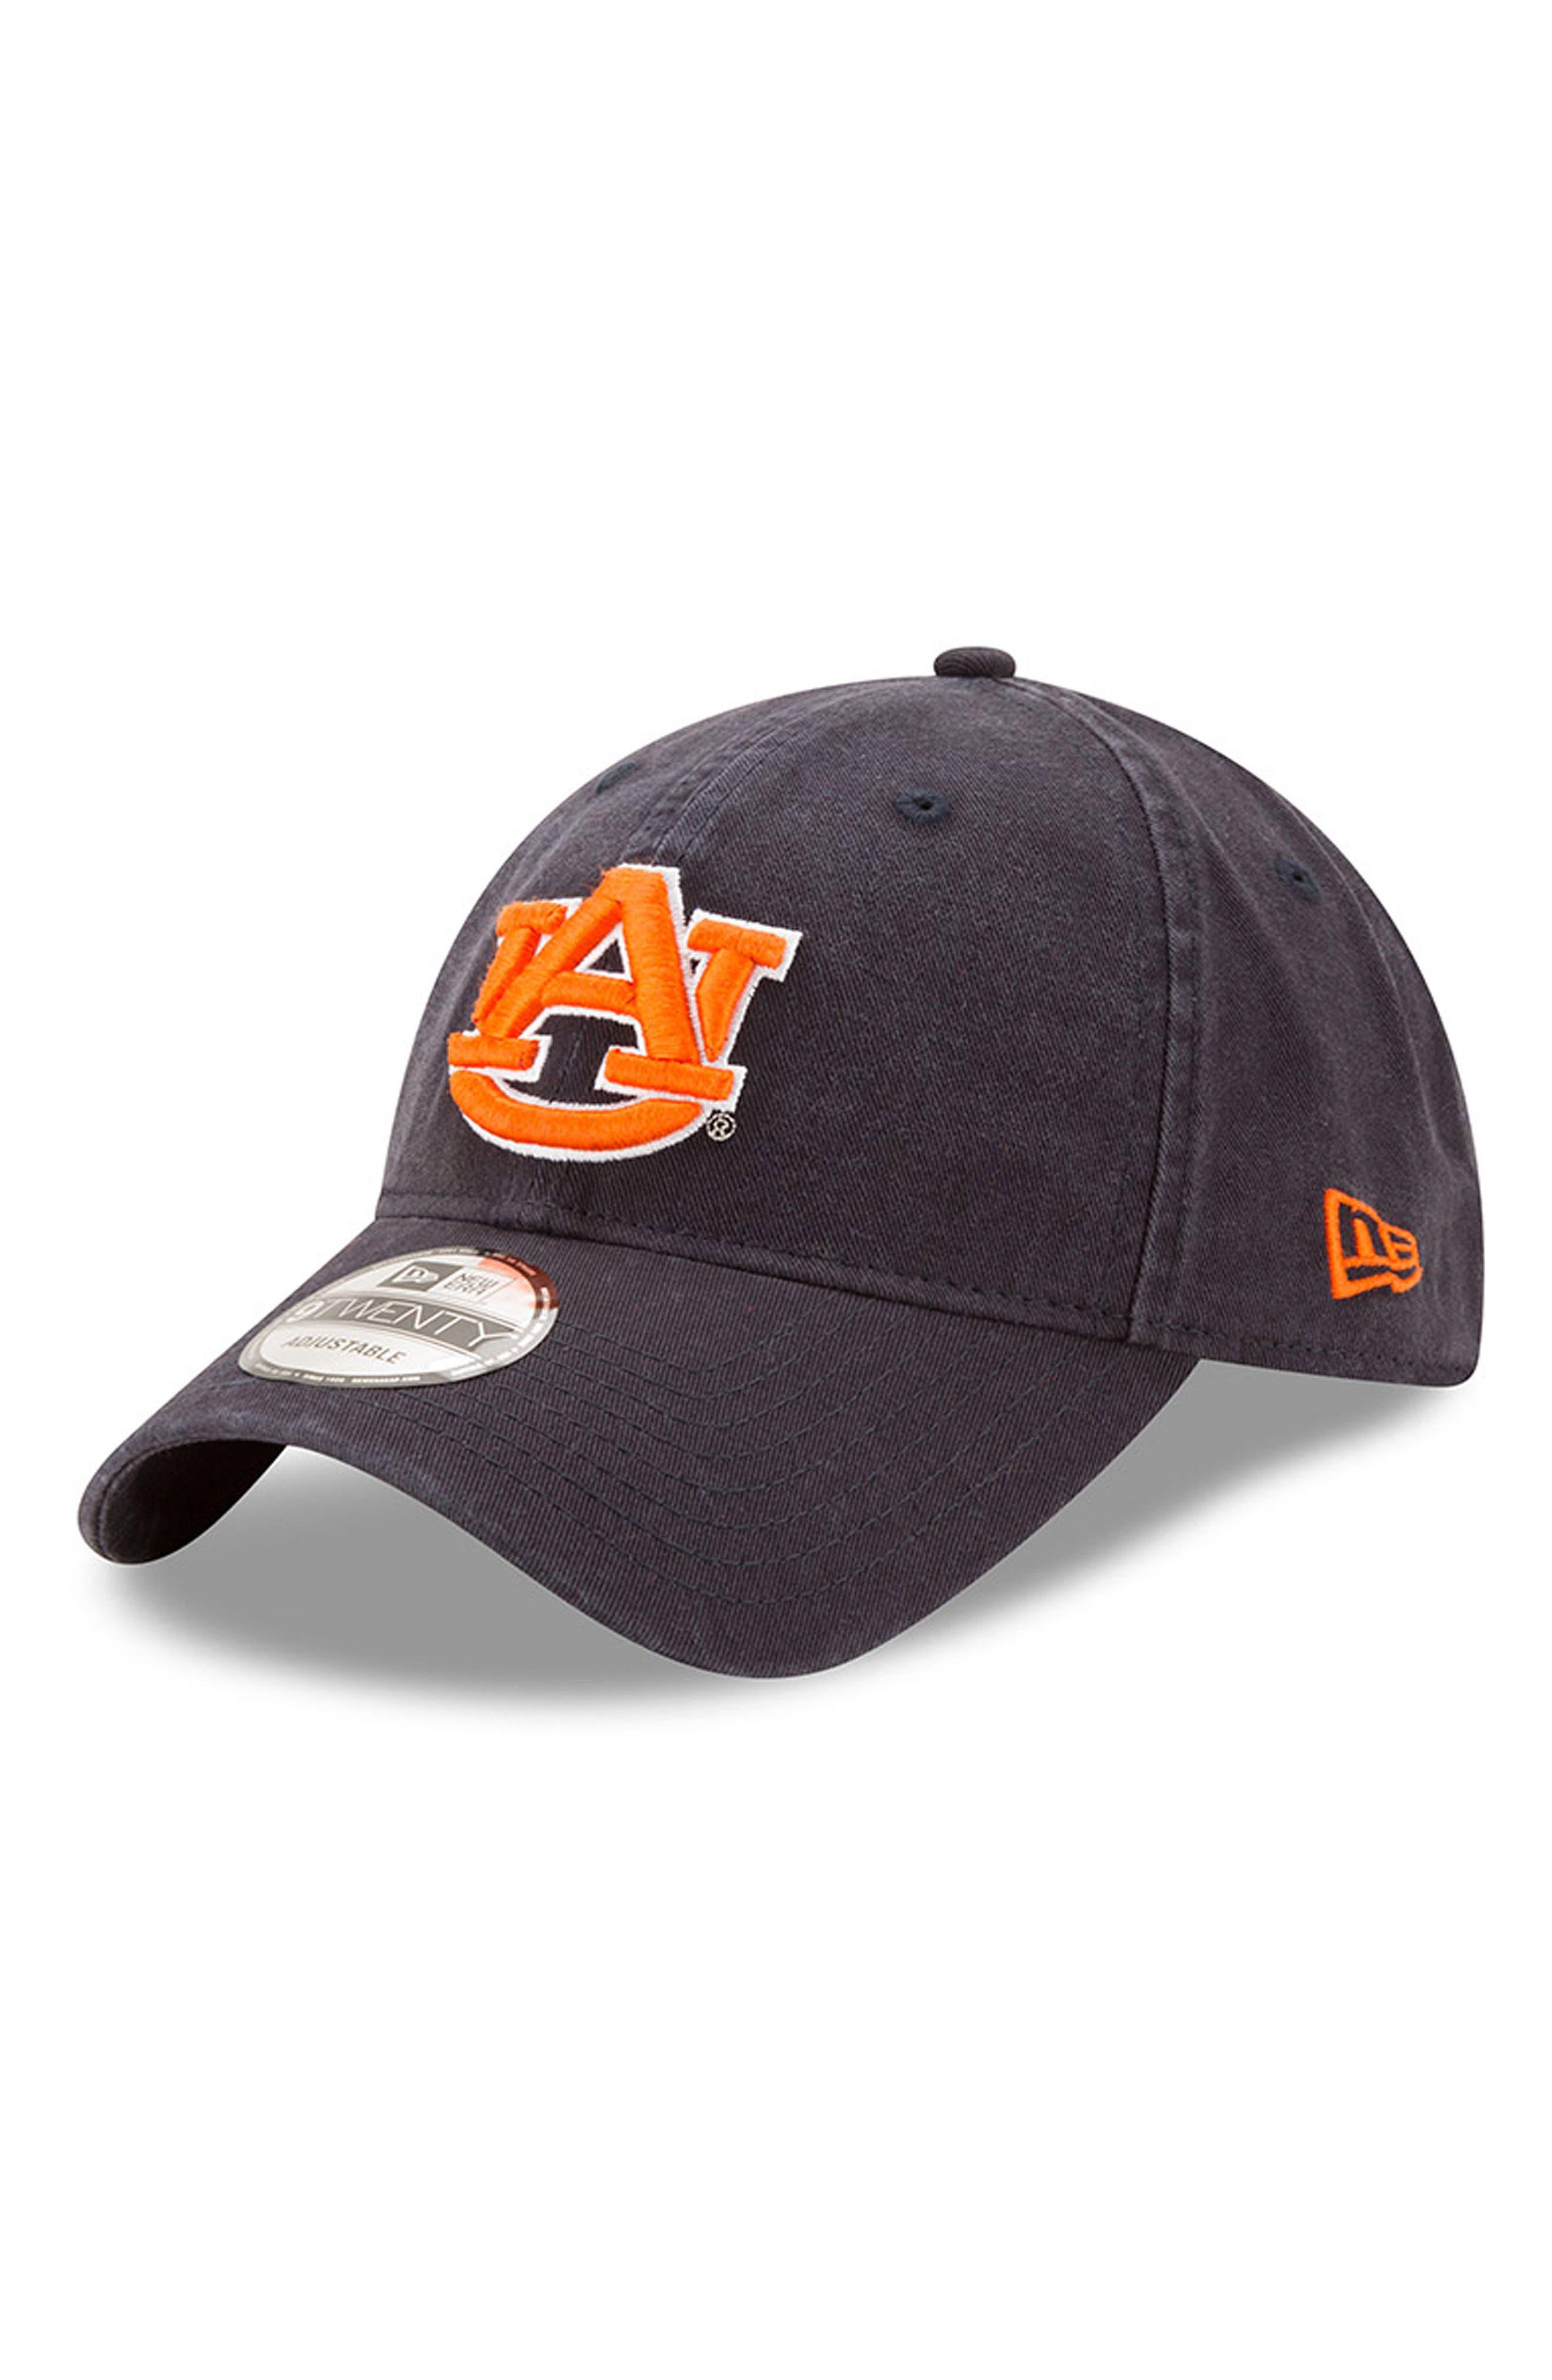 New Era Collegiate Core Classic - Auburn Tigers Baseball Cap,                             Main thumbnail 1, color,                             Auburn Tigers